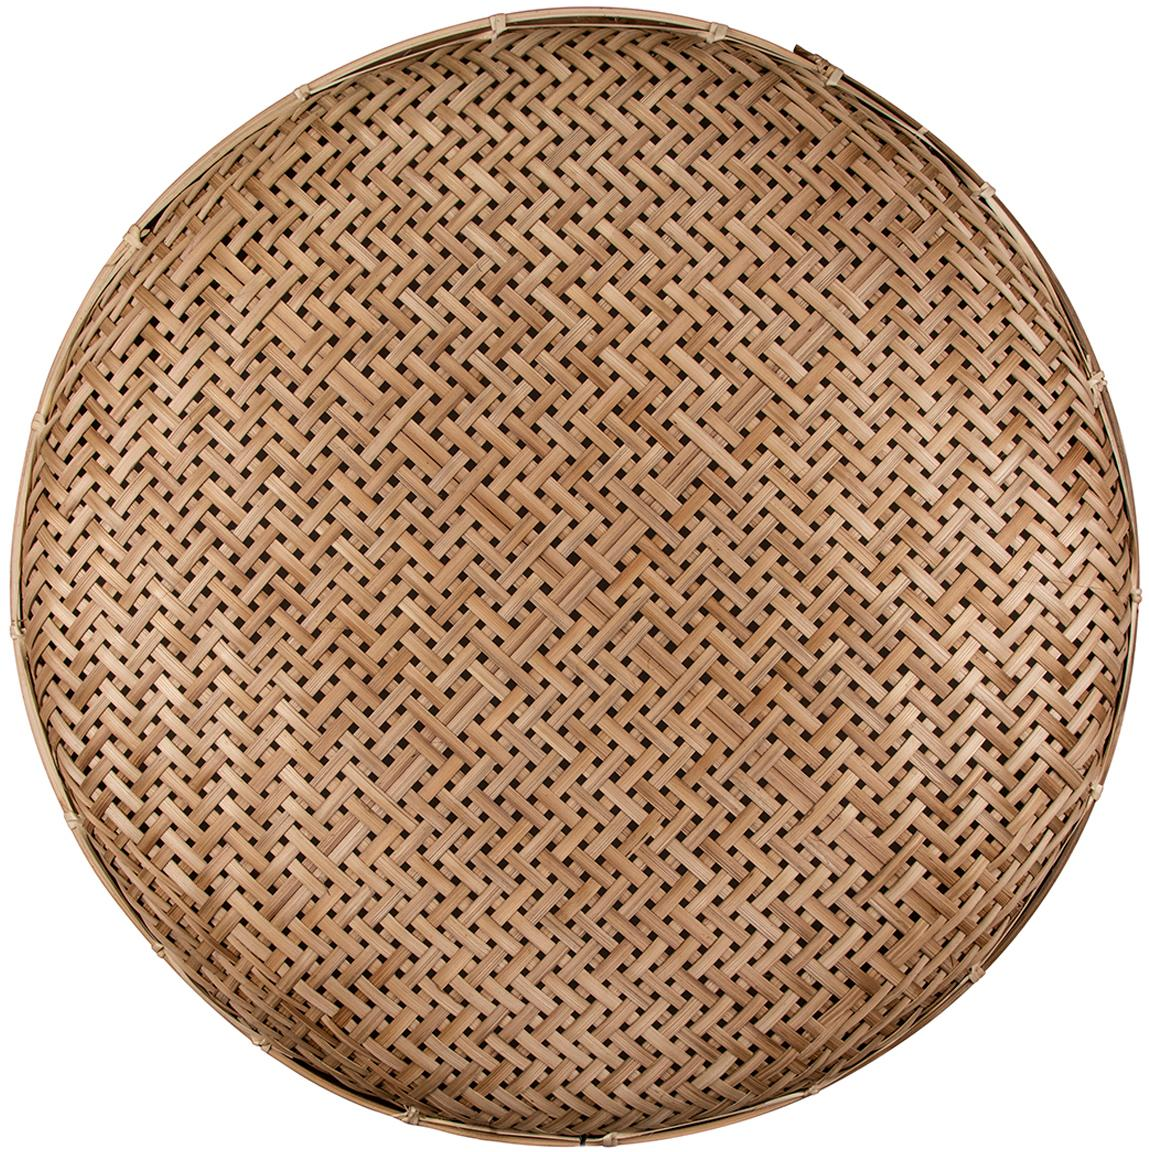 Rattan-Wandleuchte Aruba mit Stecker, Lampenschirm: Rattan, Rattan, Ø 50 x T 5 cm